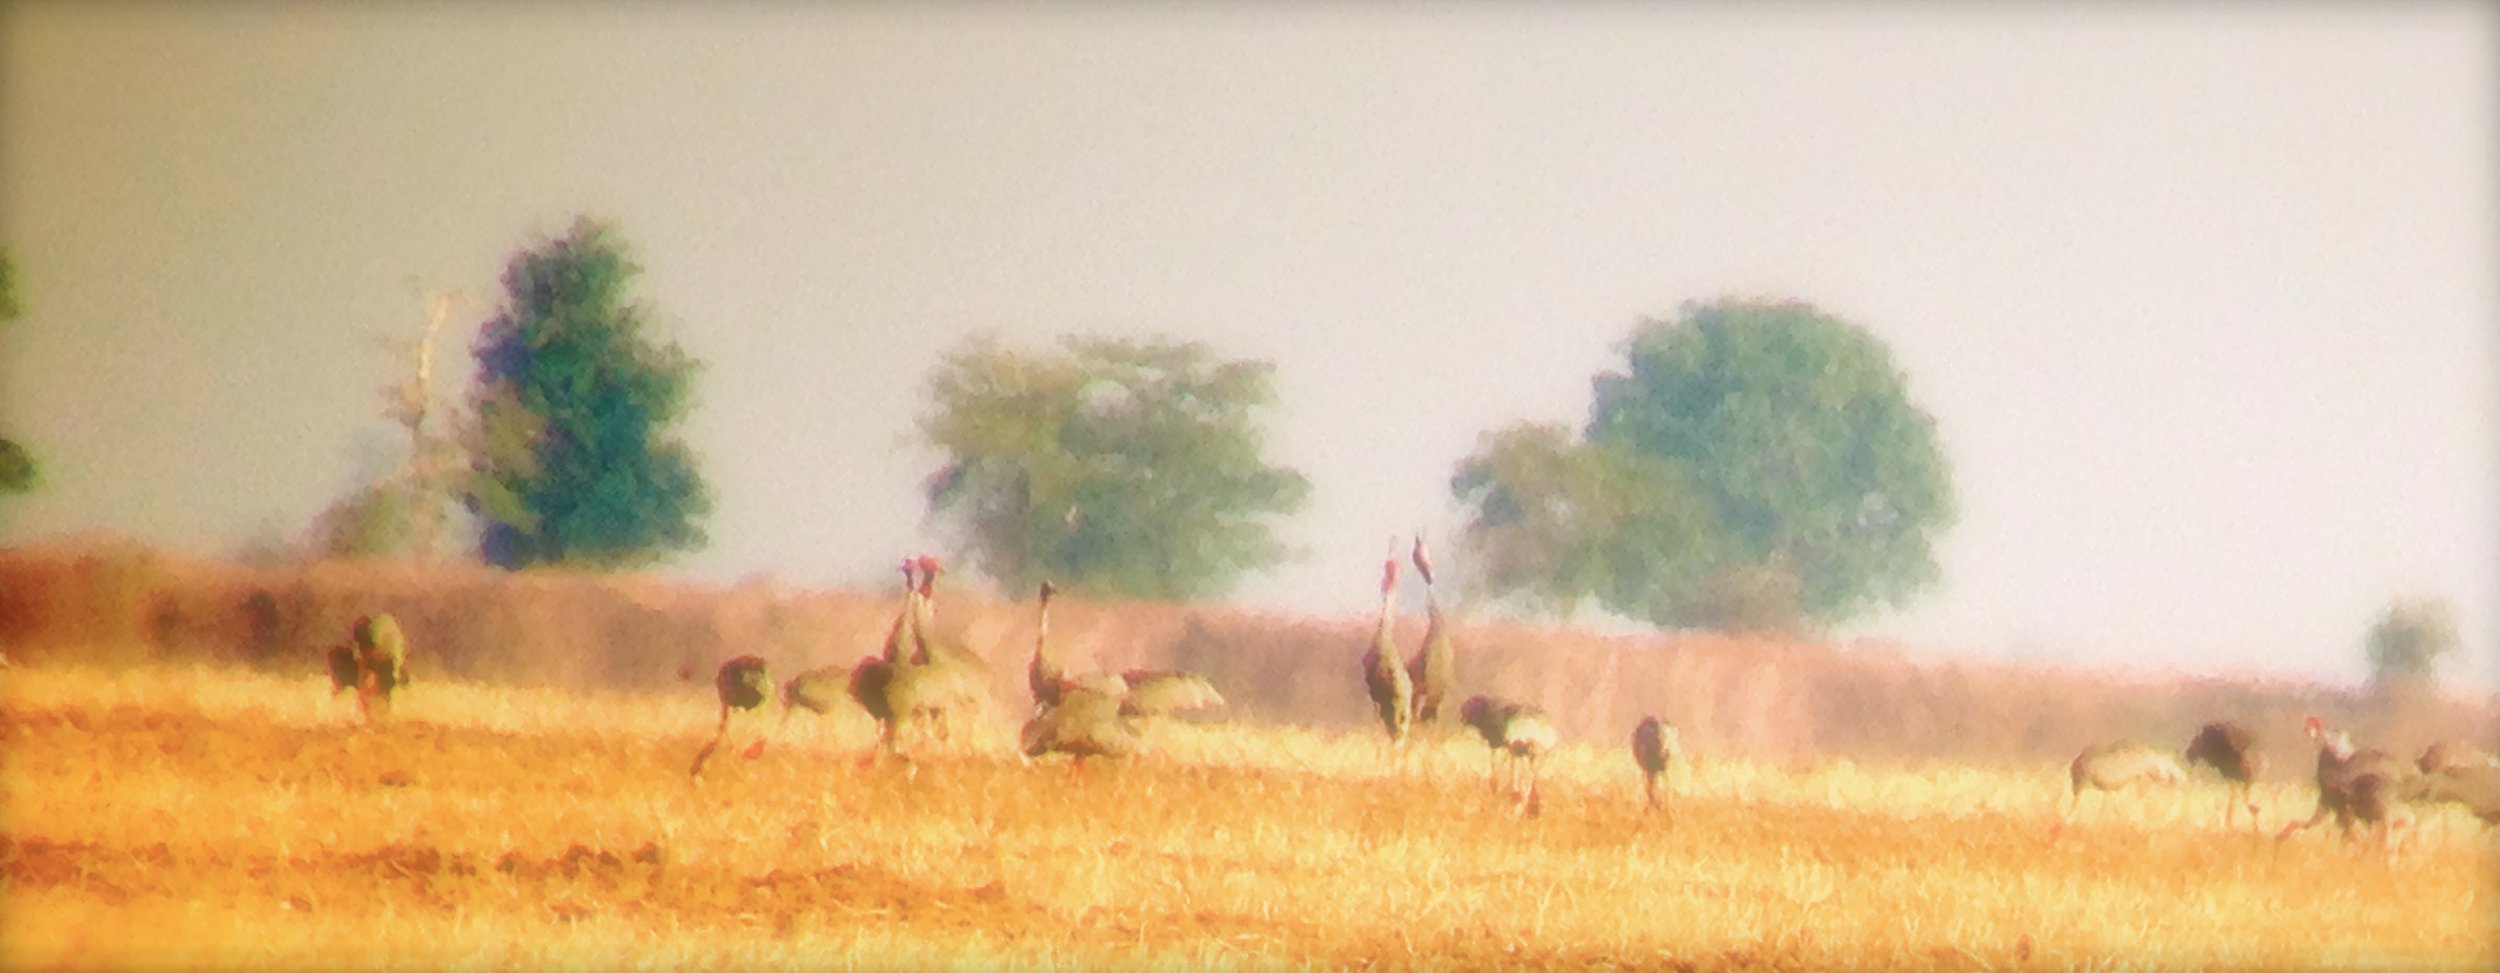 Sarus cranes2 Cambodia March 2014.jpg